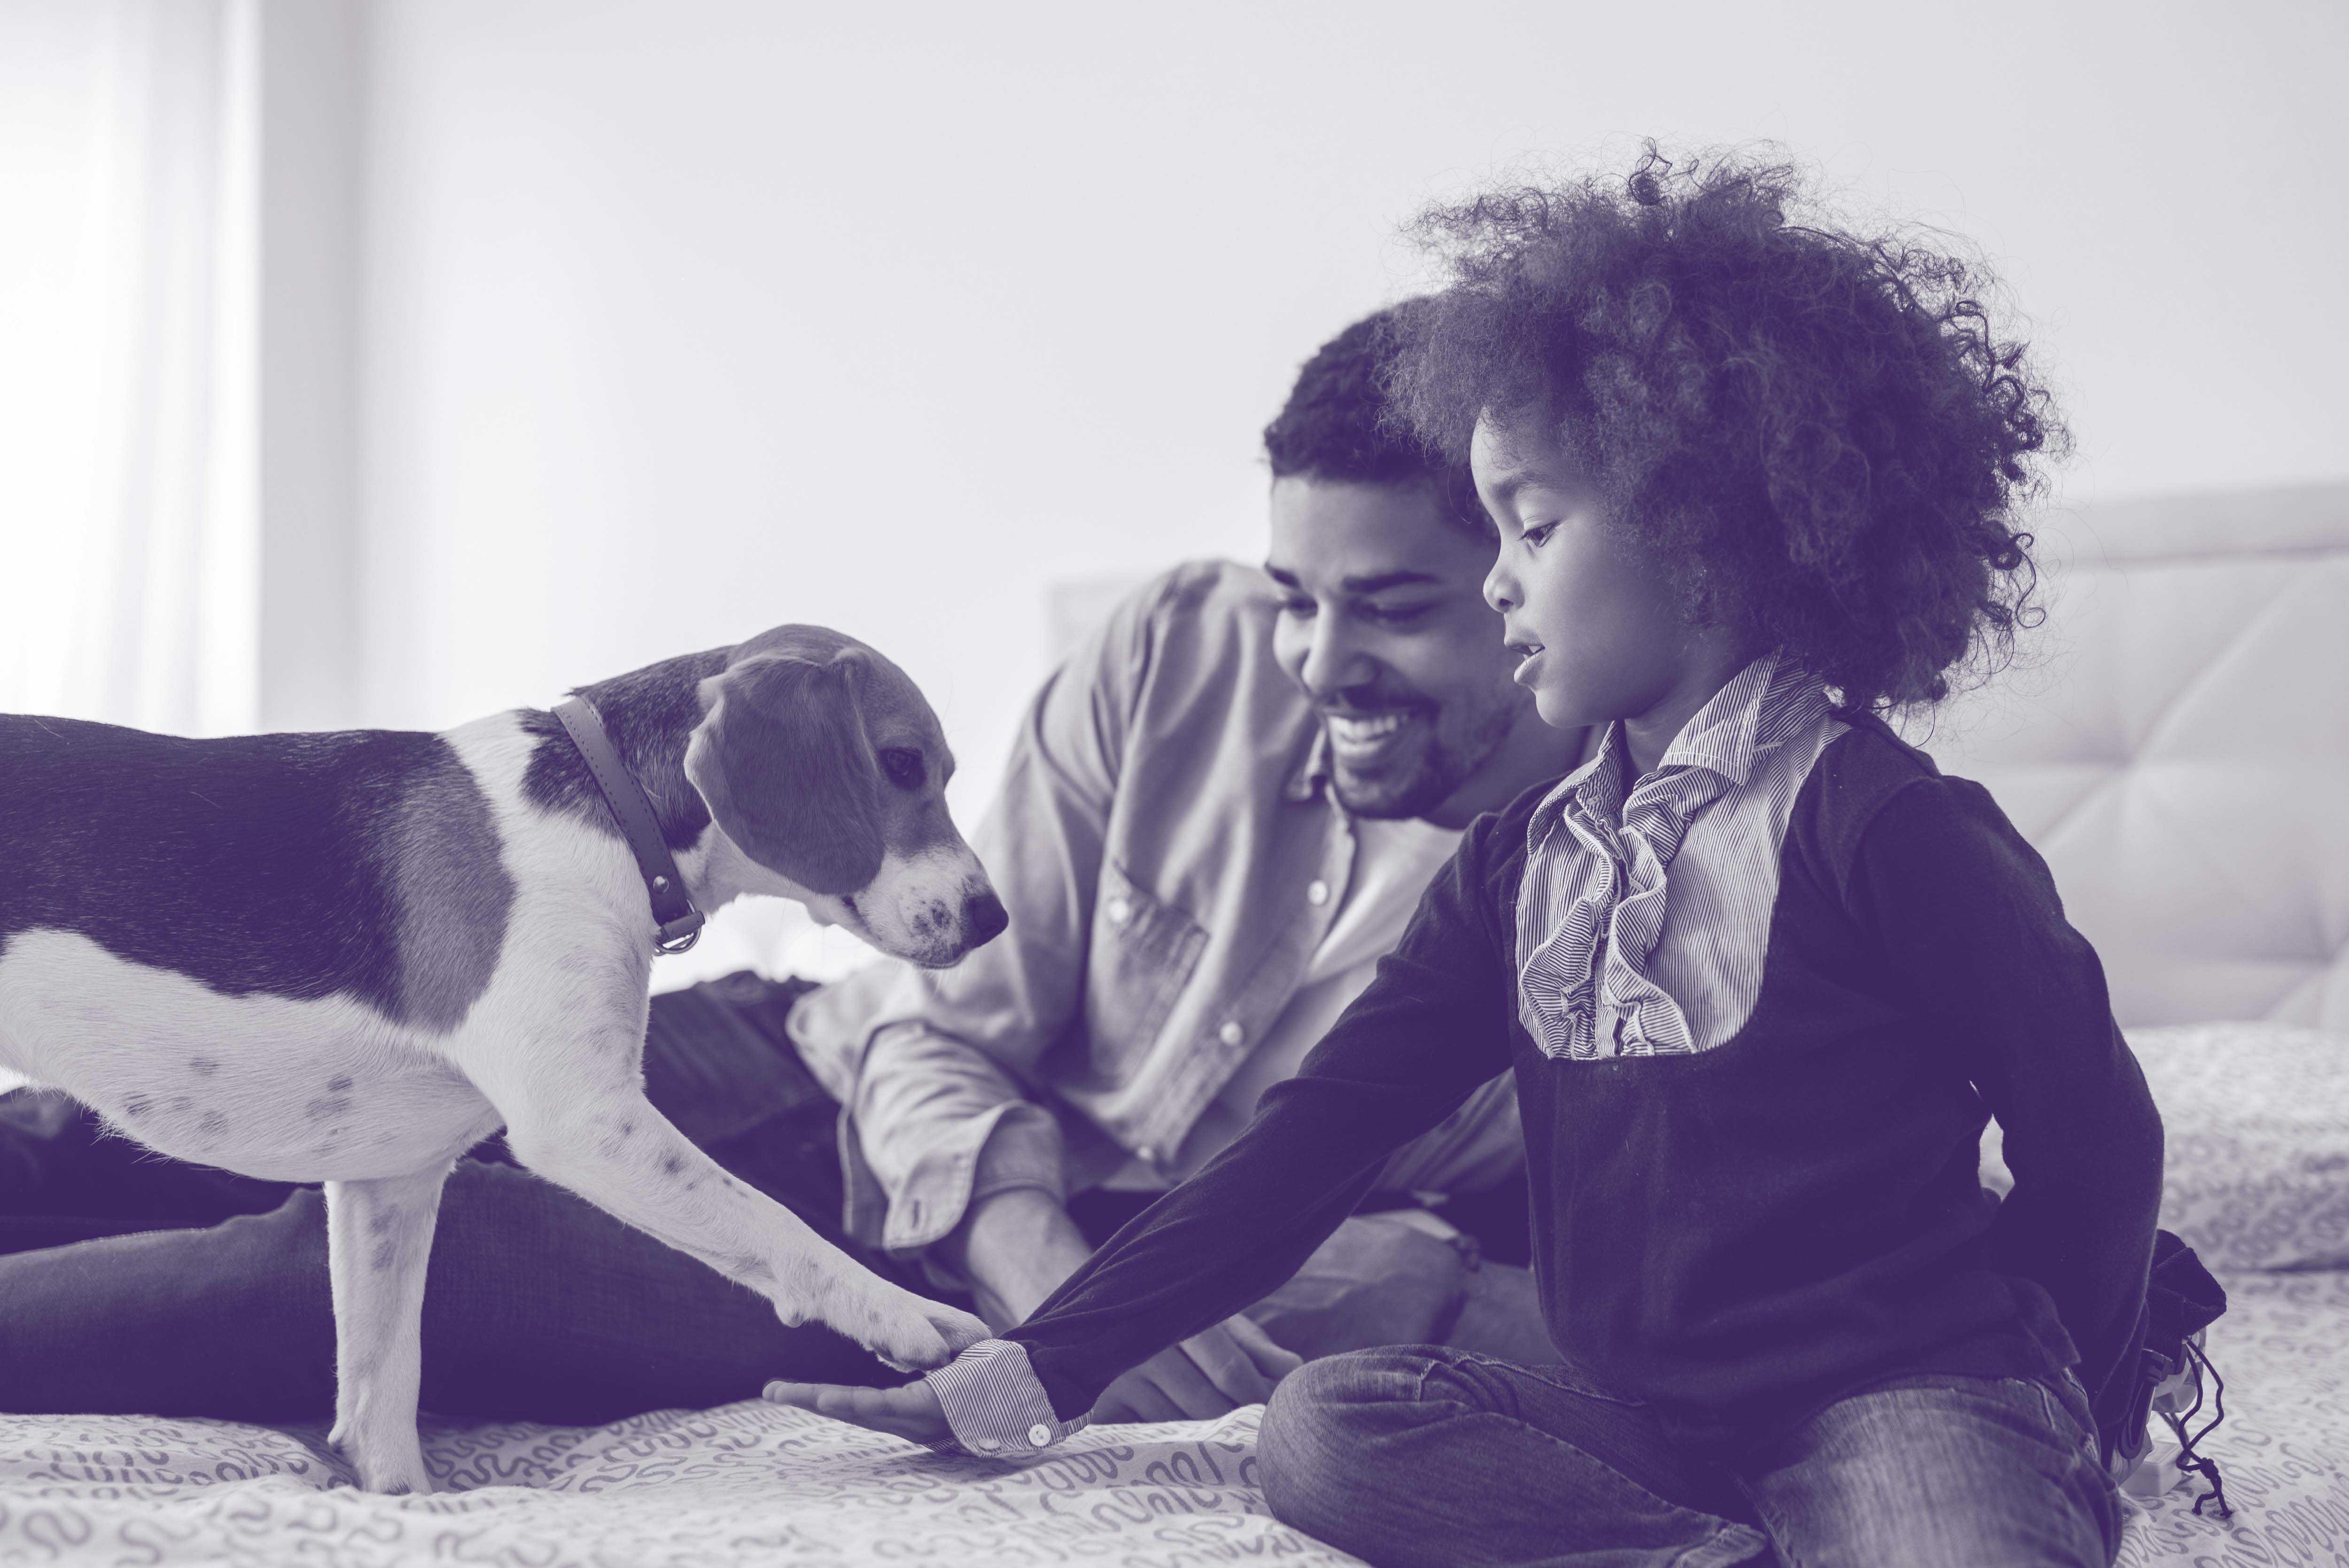 21st century family life